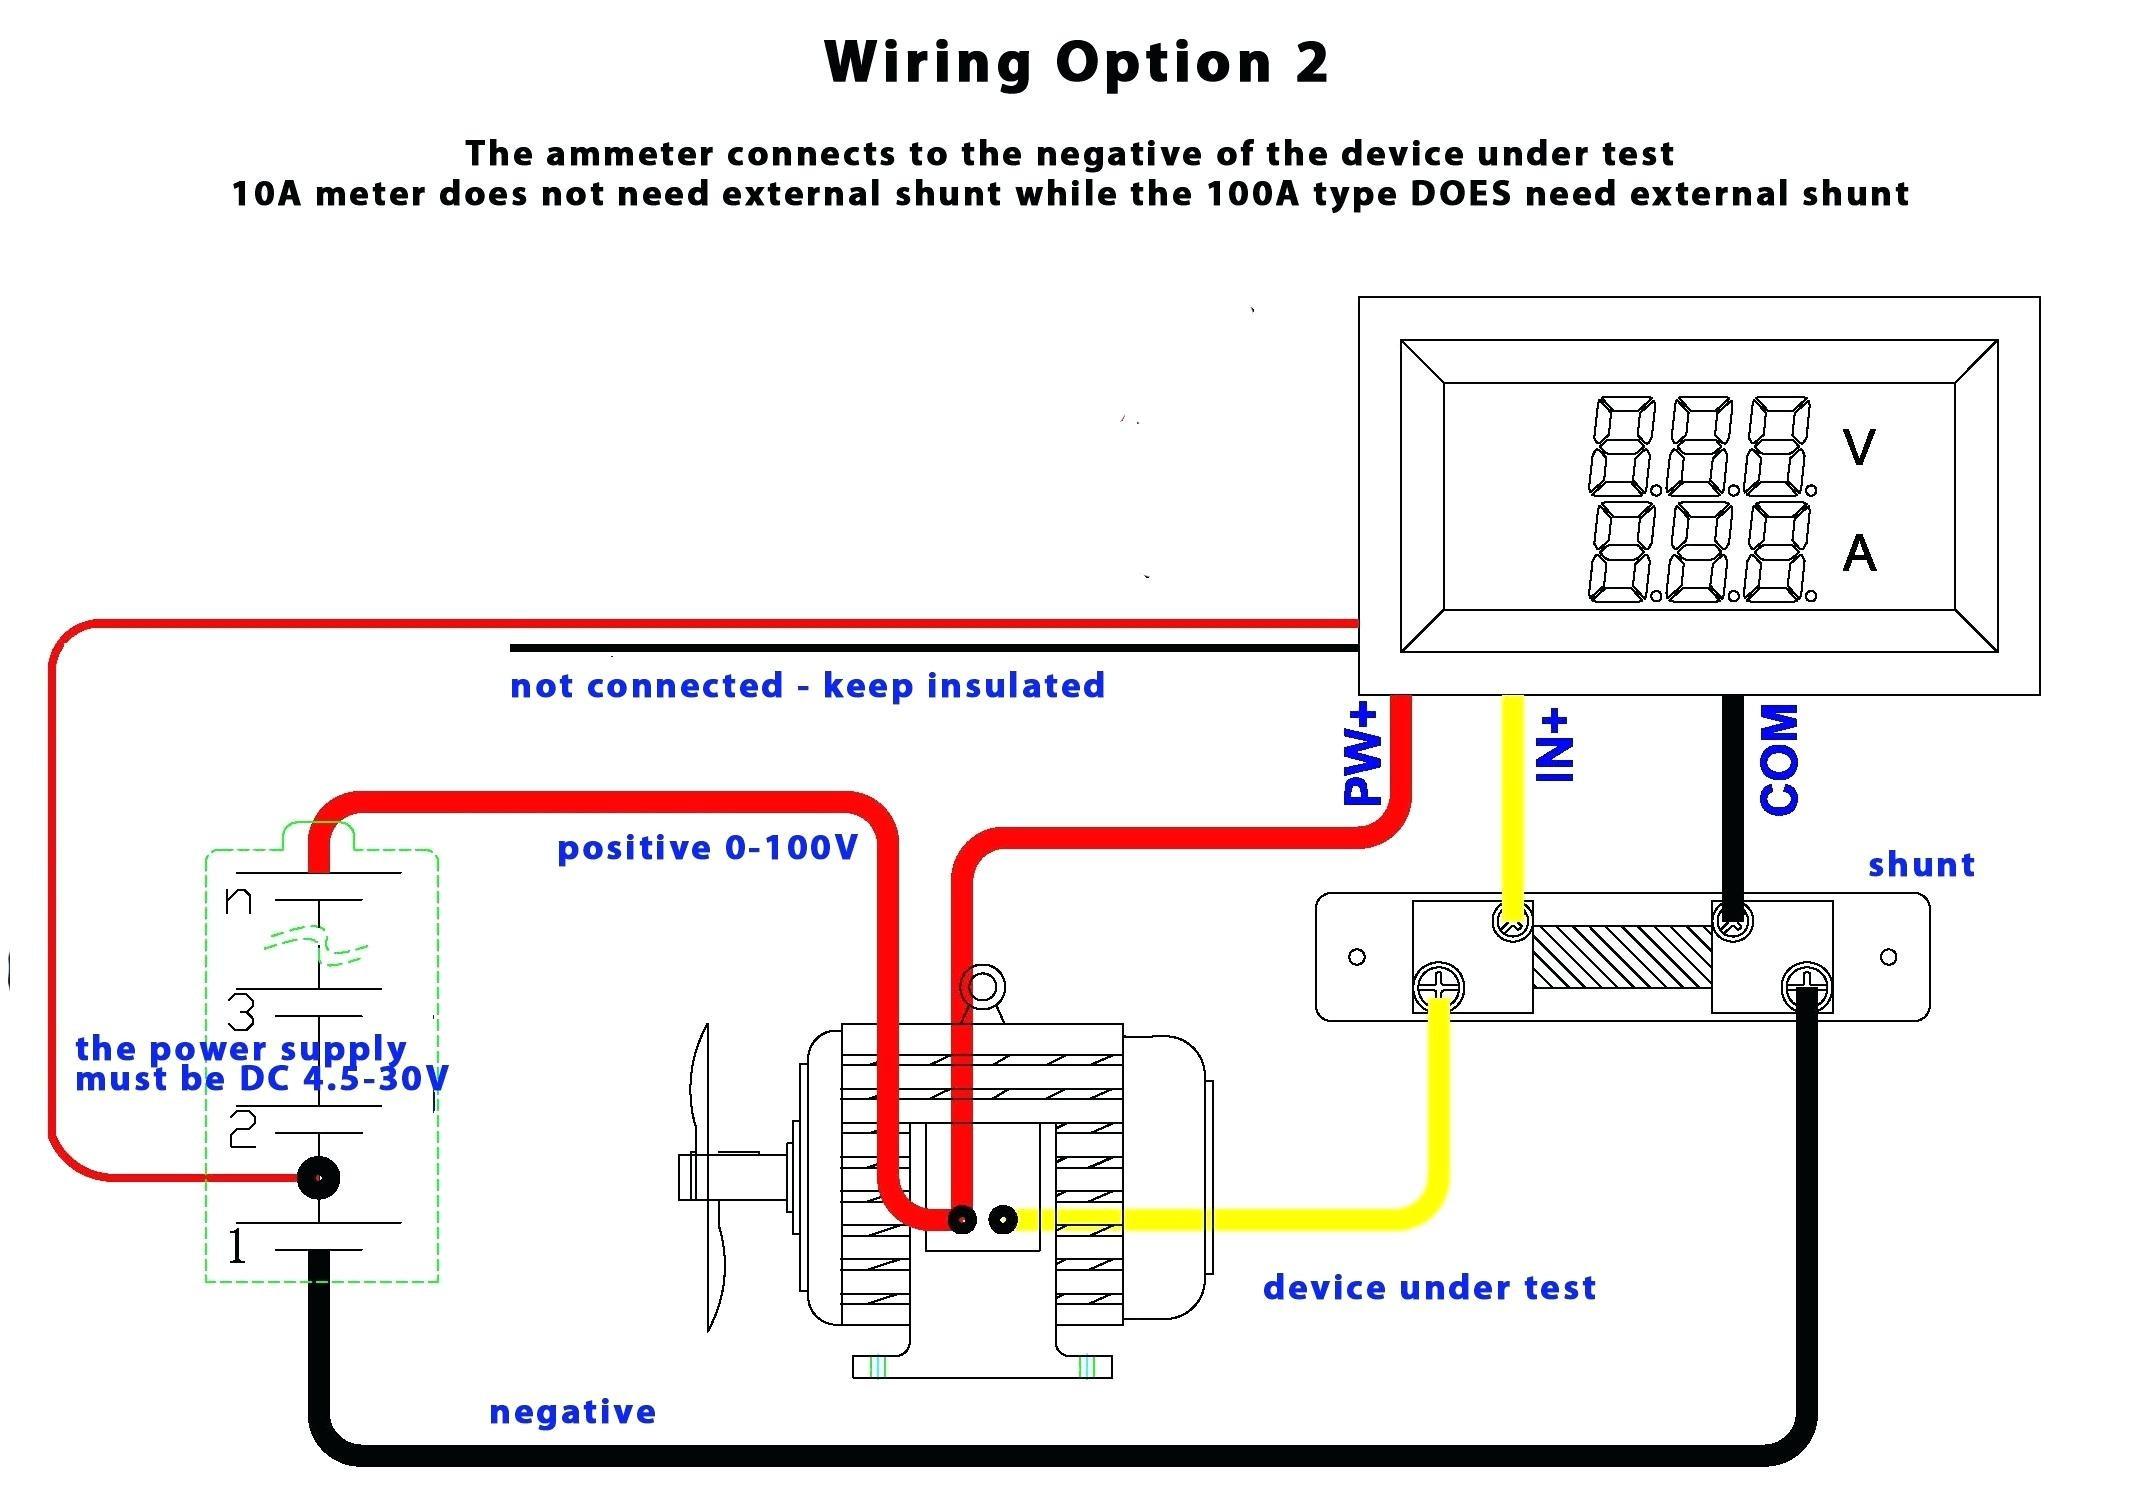 Wiring Diagram For My Guitar Fresh 5 Way Switch Wiring Diagram Best Wiring Diagram Fender 5 Way